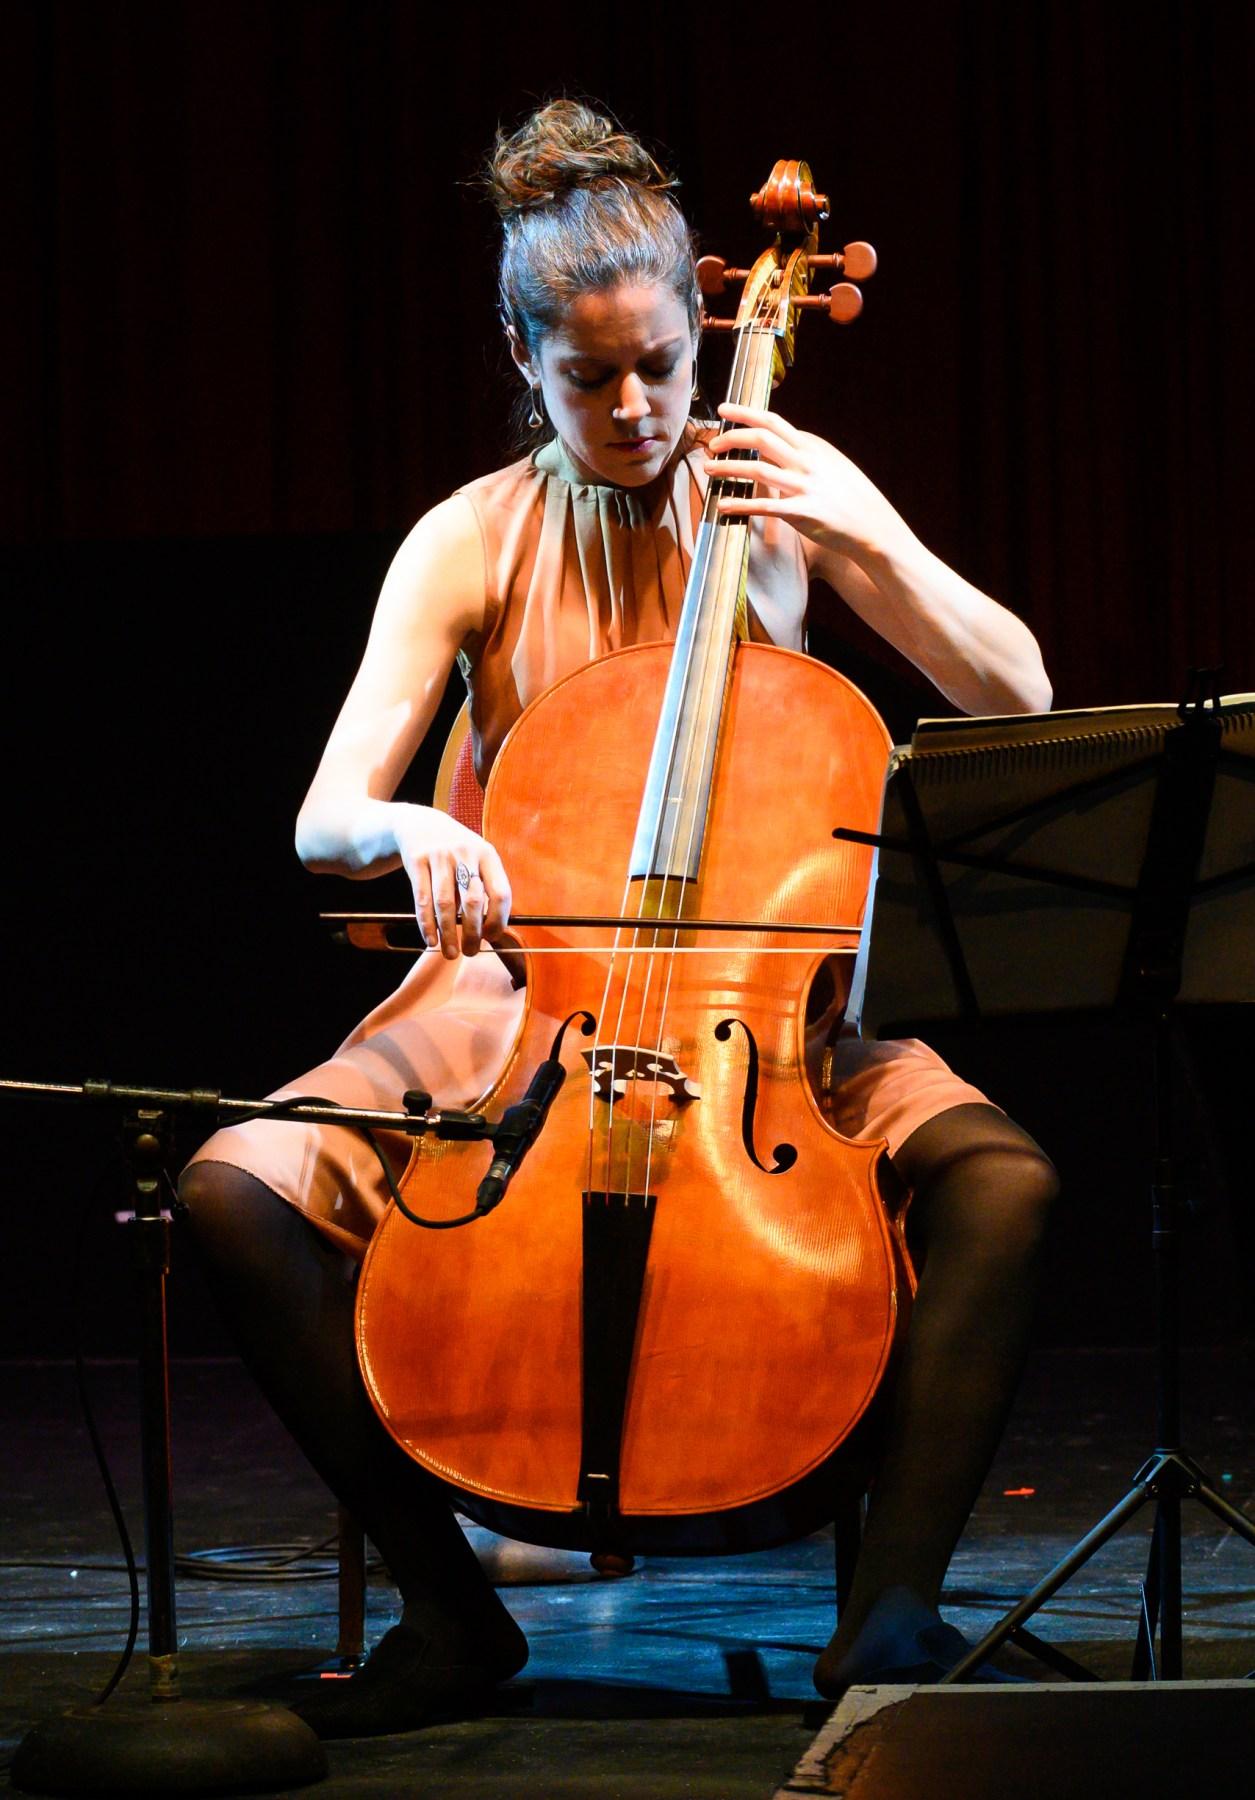 Elinor Frey, baroque cello, AMOT 2019